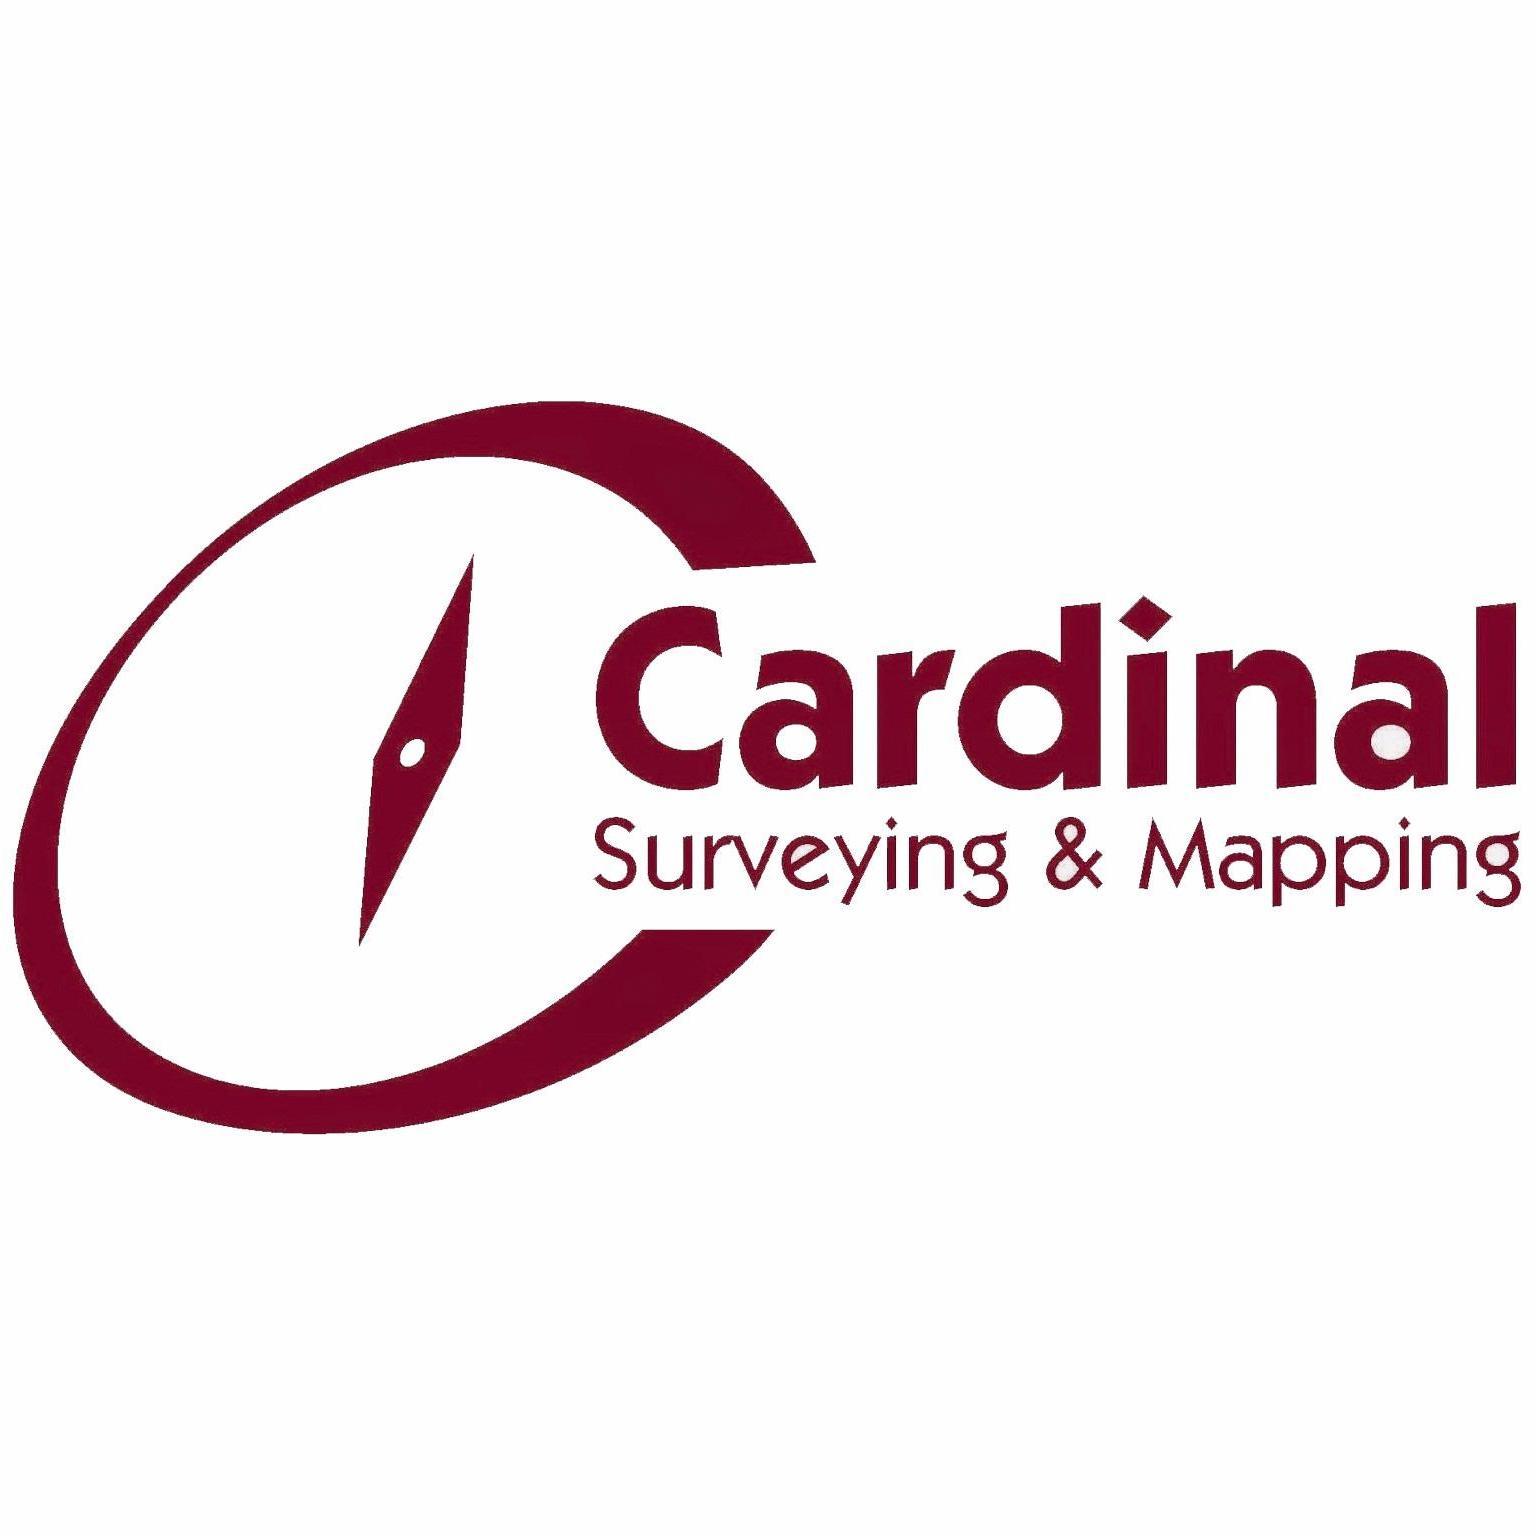 Cardinal Surveying & Mapping image 3